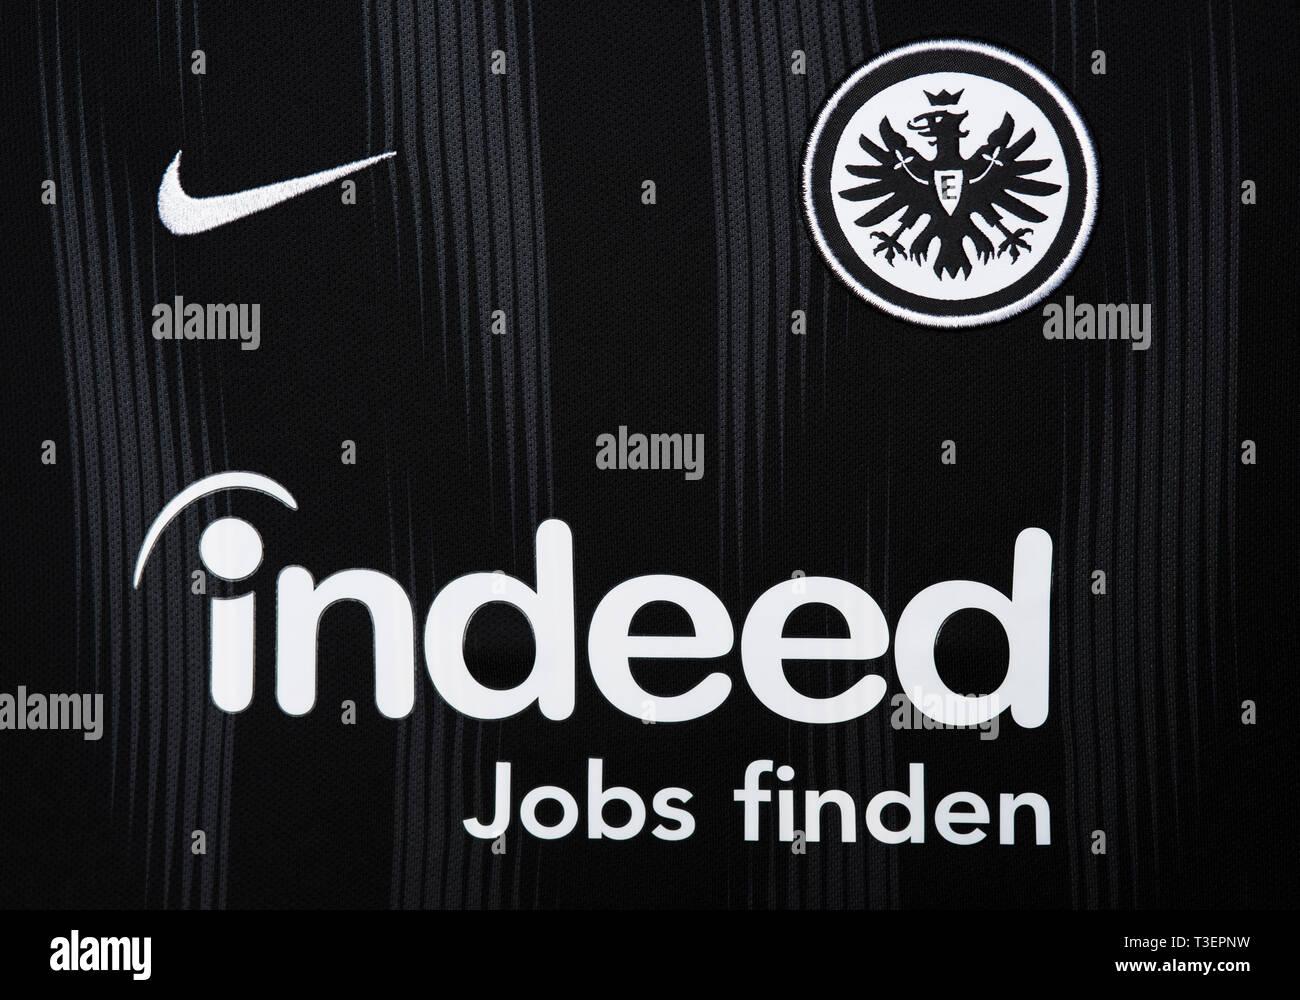 Close up of Eintracht Frankfurt jersey. - Stock Image